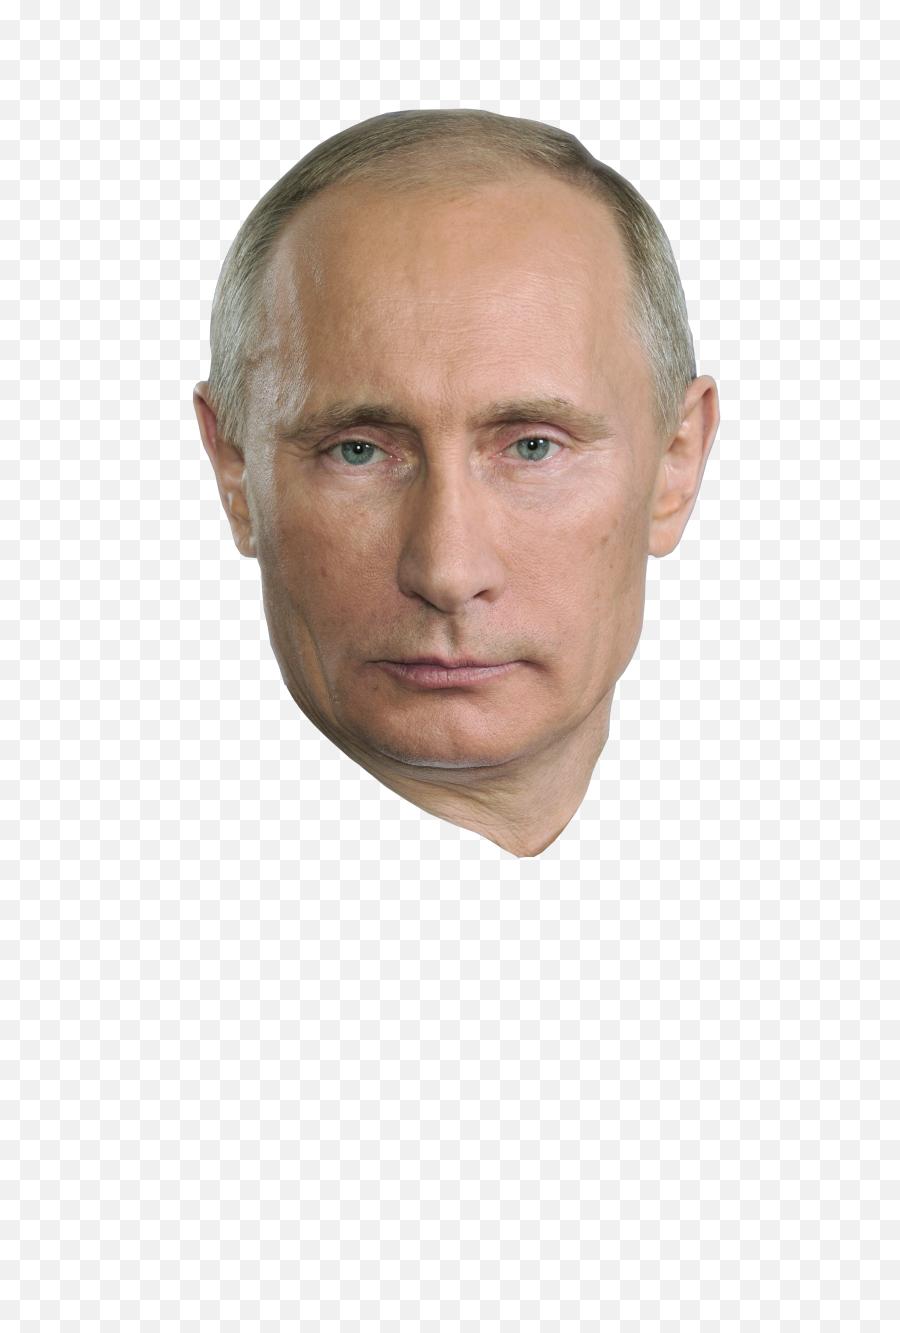 Vladimir Putin Face Png Image Vladimir Putin Face Transparent Free Transparent Png Images Pngaaa Com